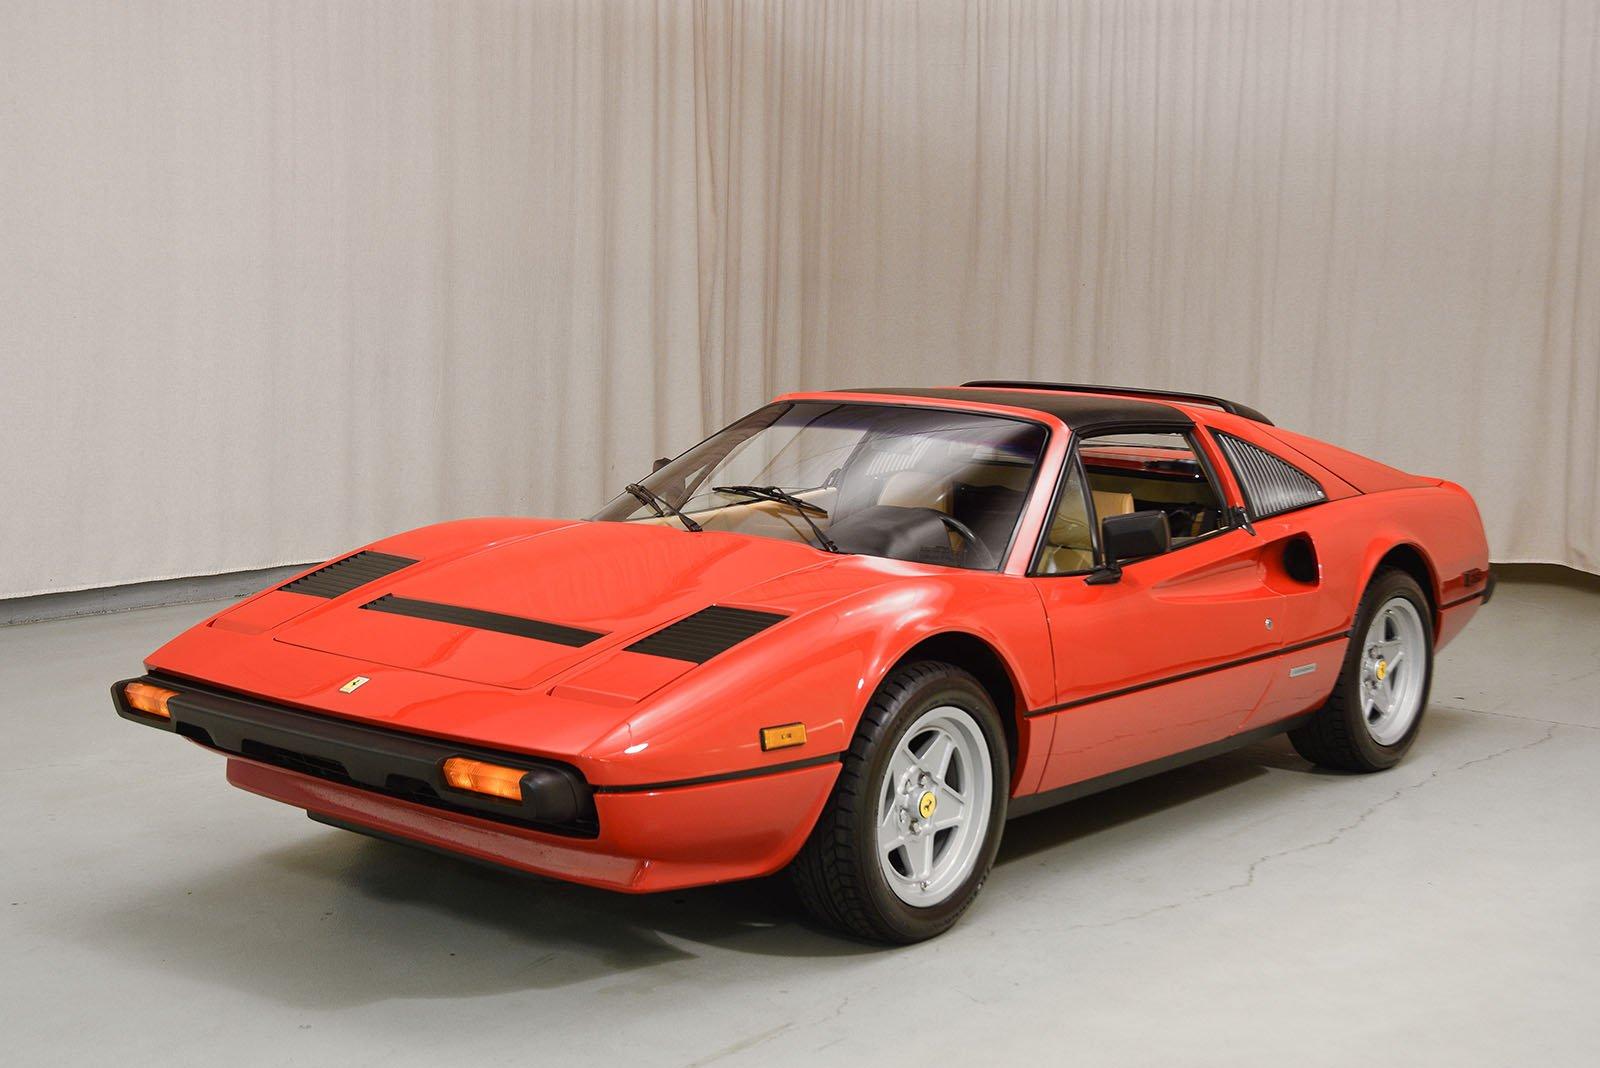 1985 ferrari 308 gtsi qv spyder hyman ltd classic cars. Black Bedroom Furniture Sets. Home Design Ideas